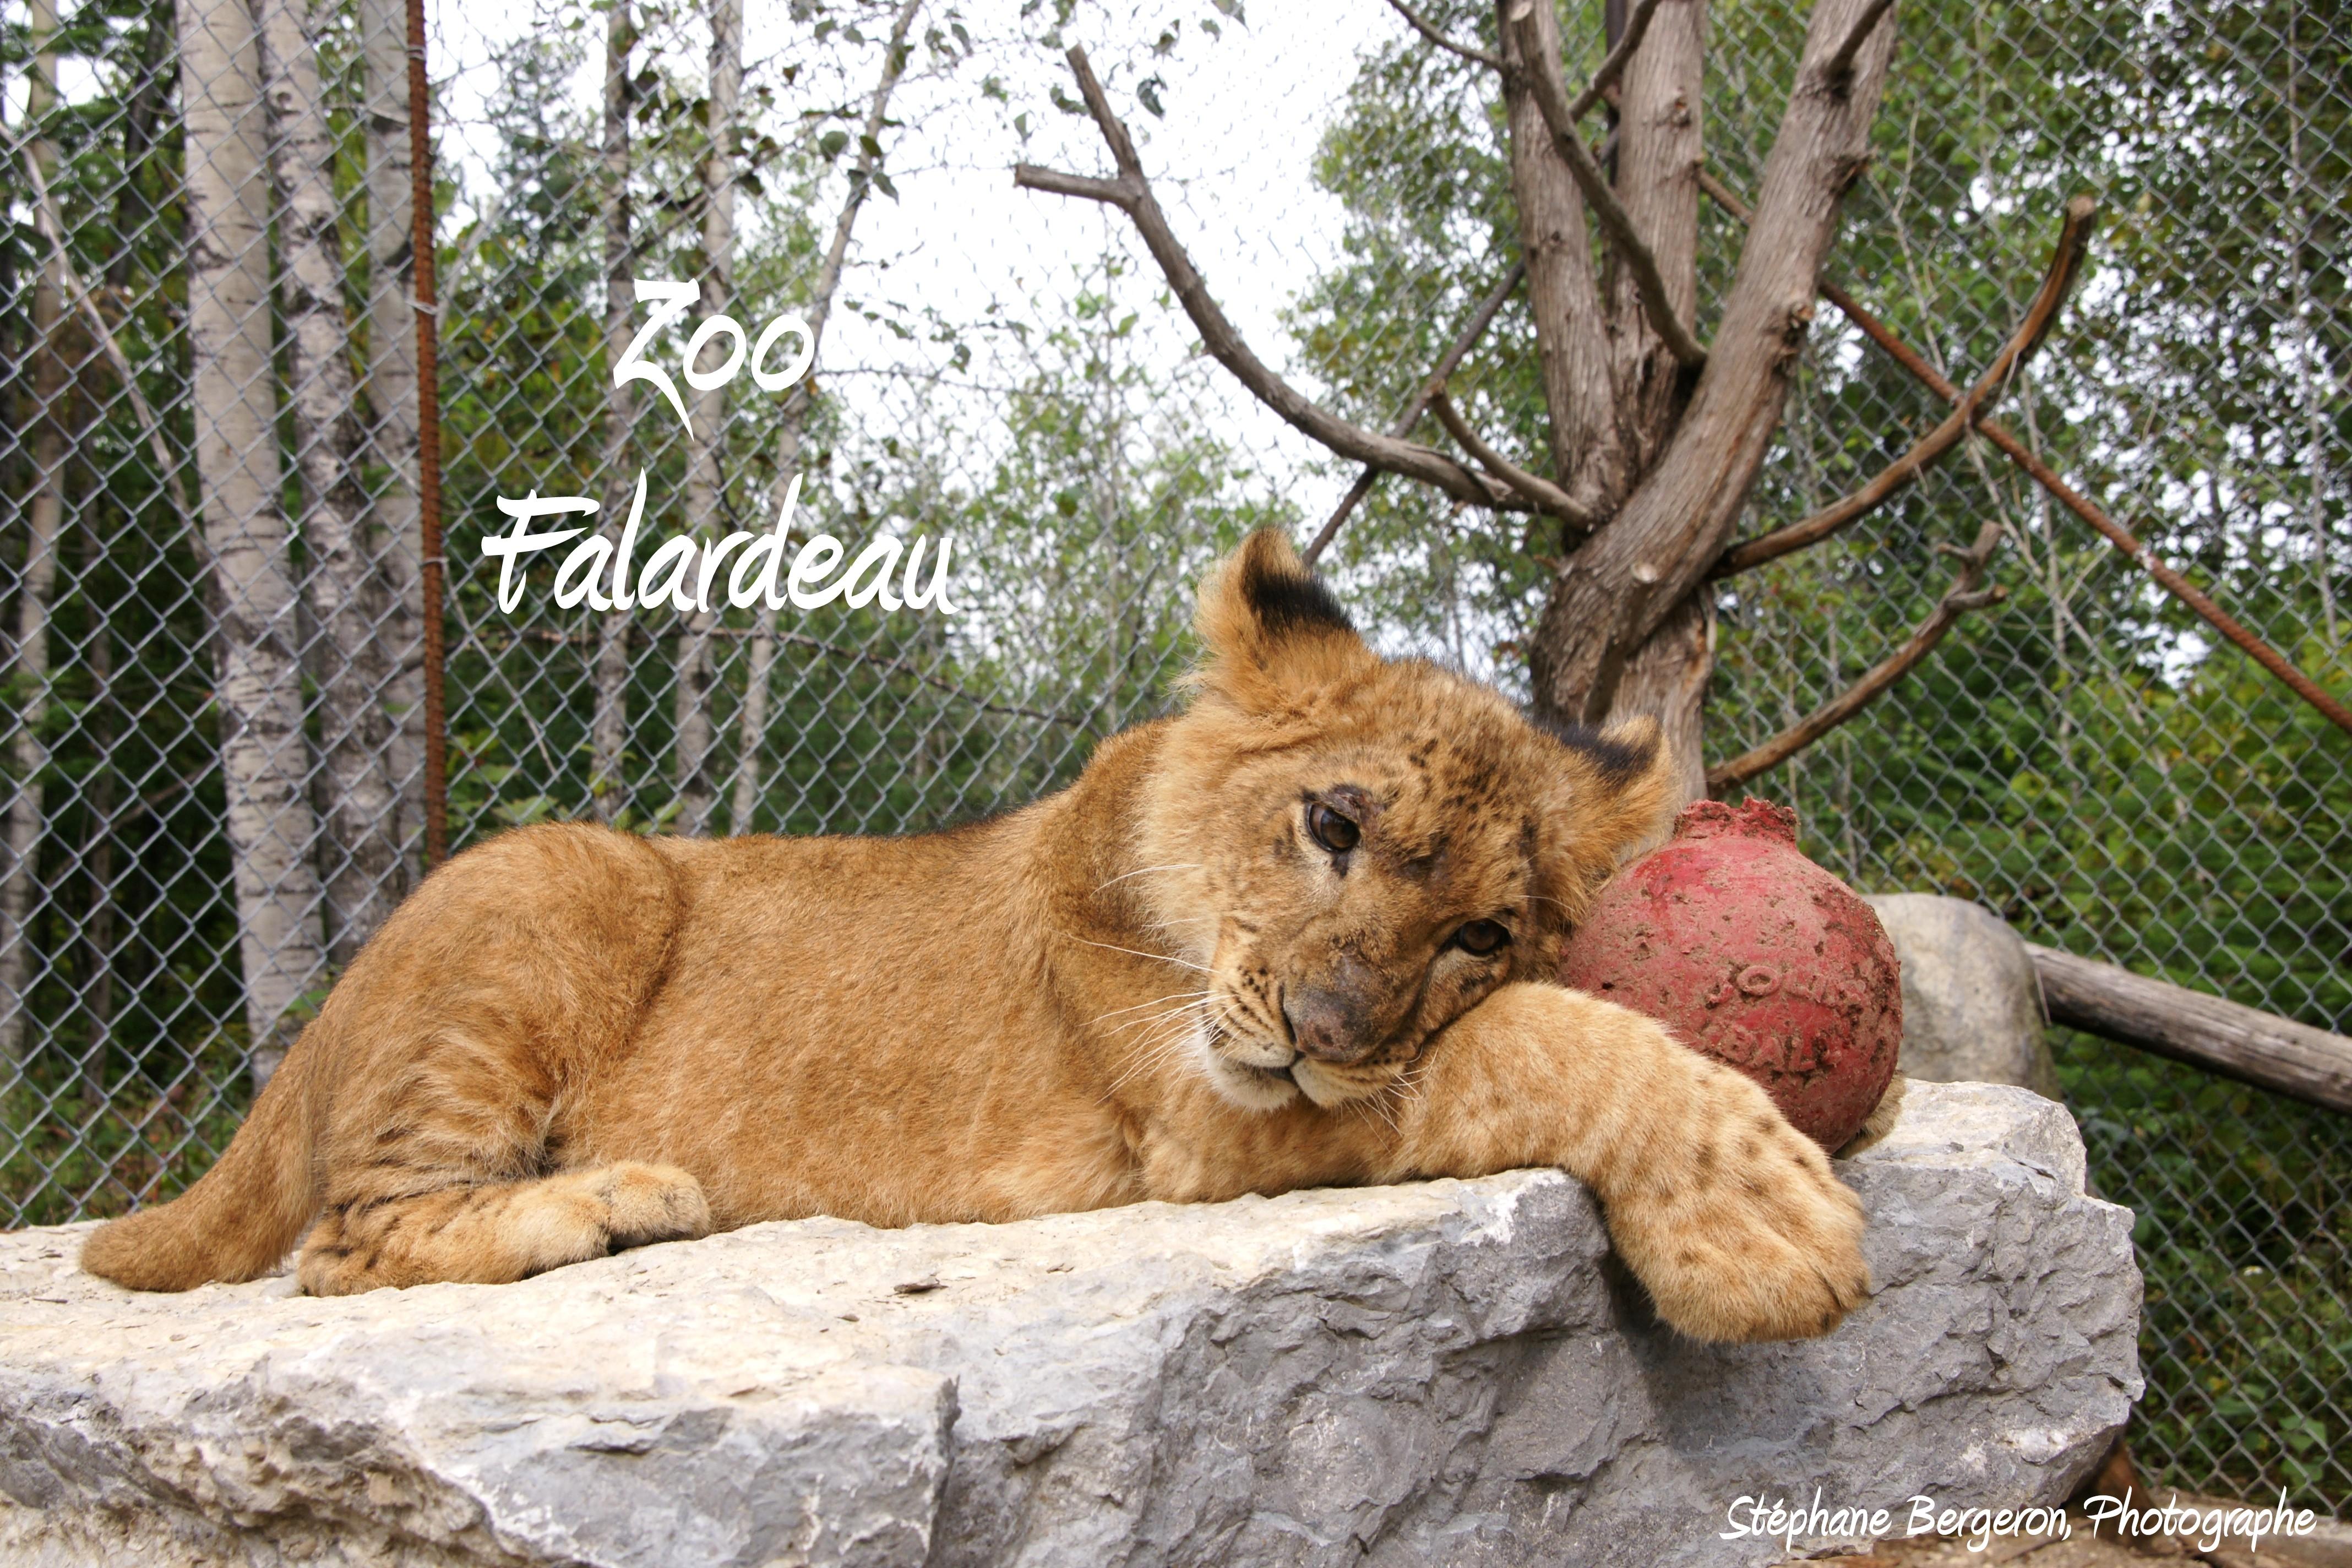 Zoo de Falardeau